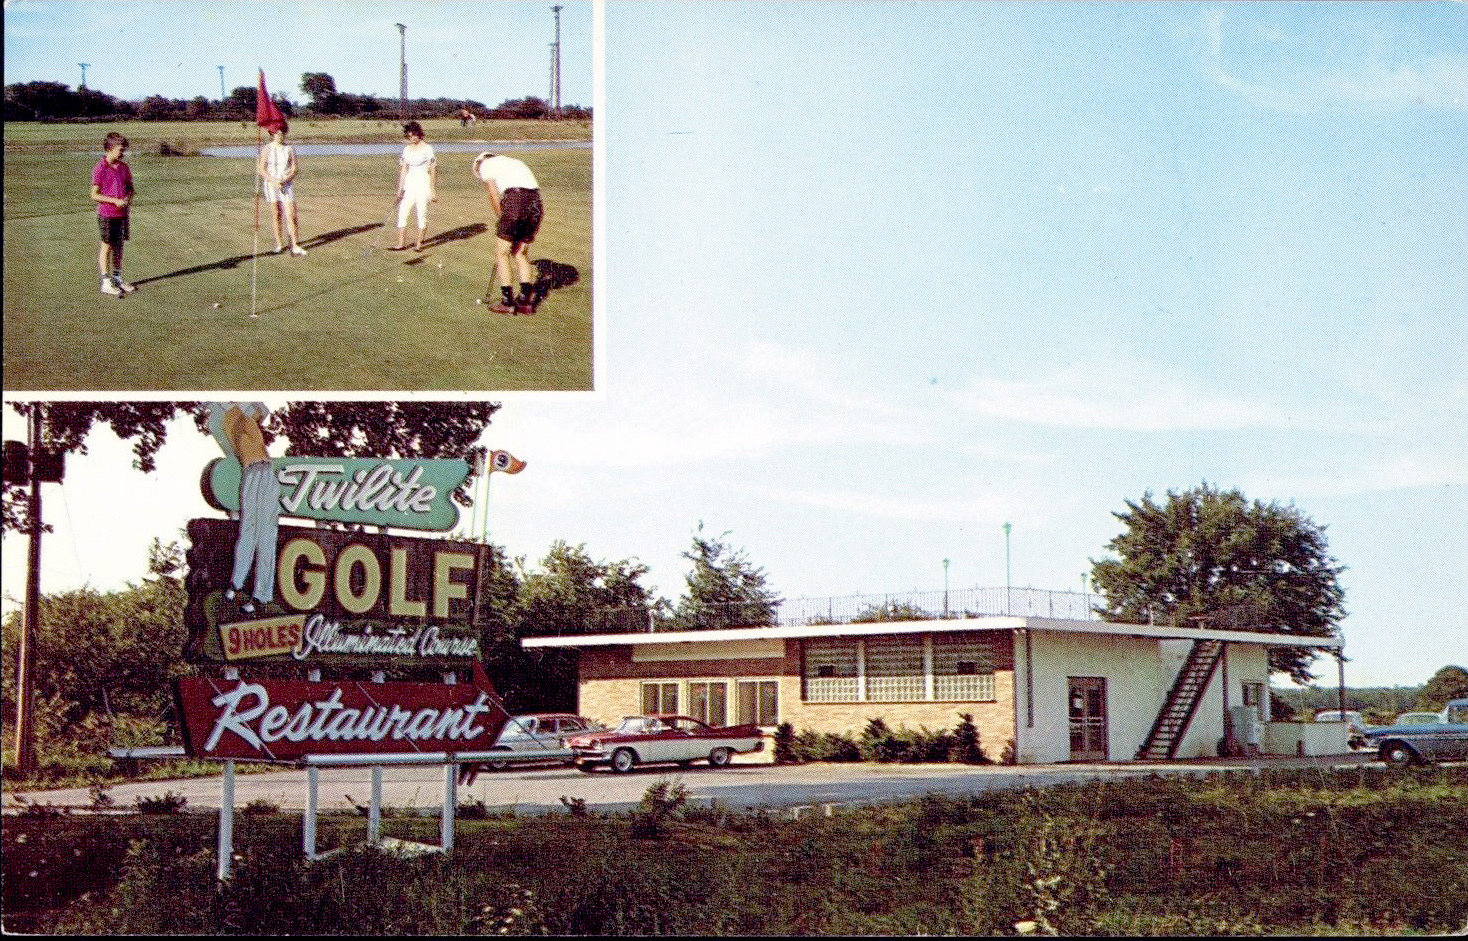 Twilite Golf Course, 3287 Niag Falls Blvd, postcard (c1960).jpg